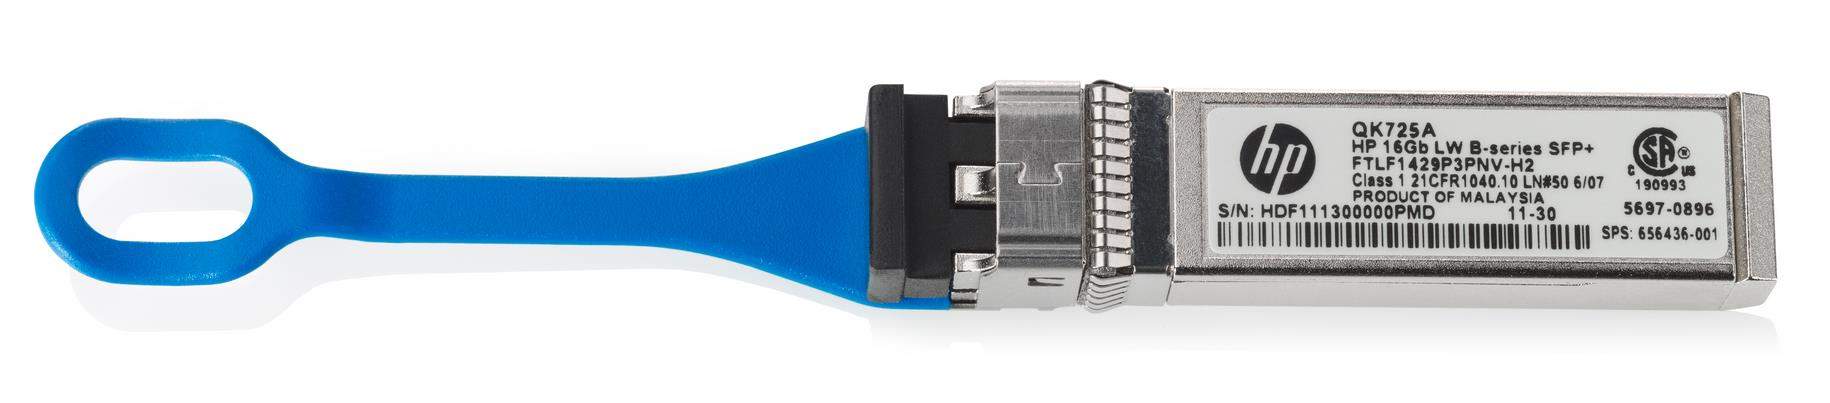 HP B-series 16Gb SFP+ Long Wave 10km Transceiver